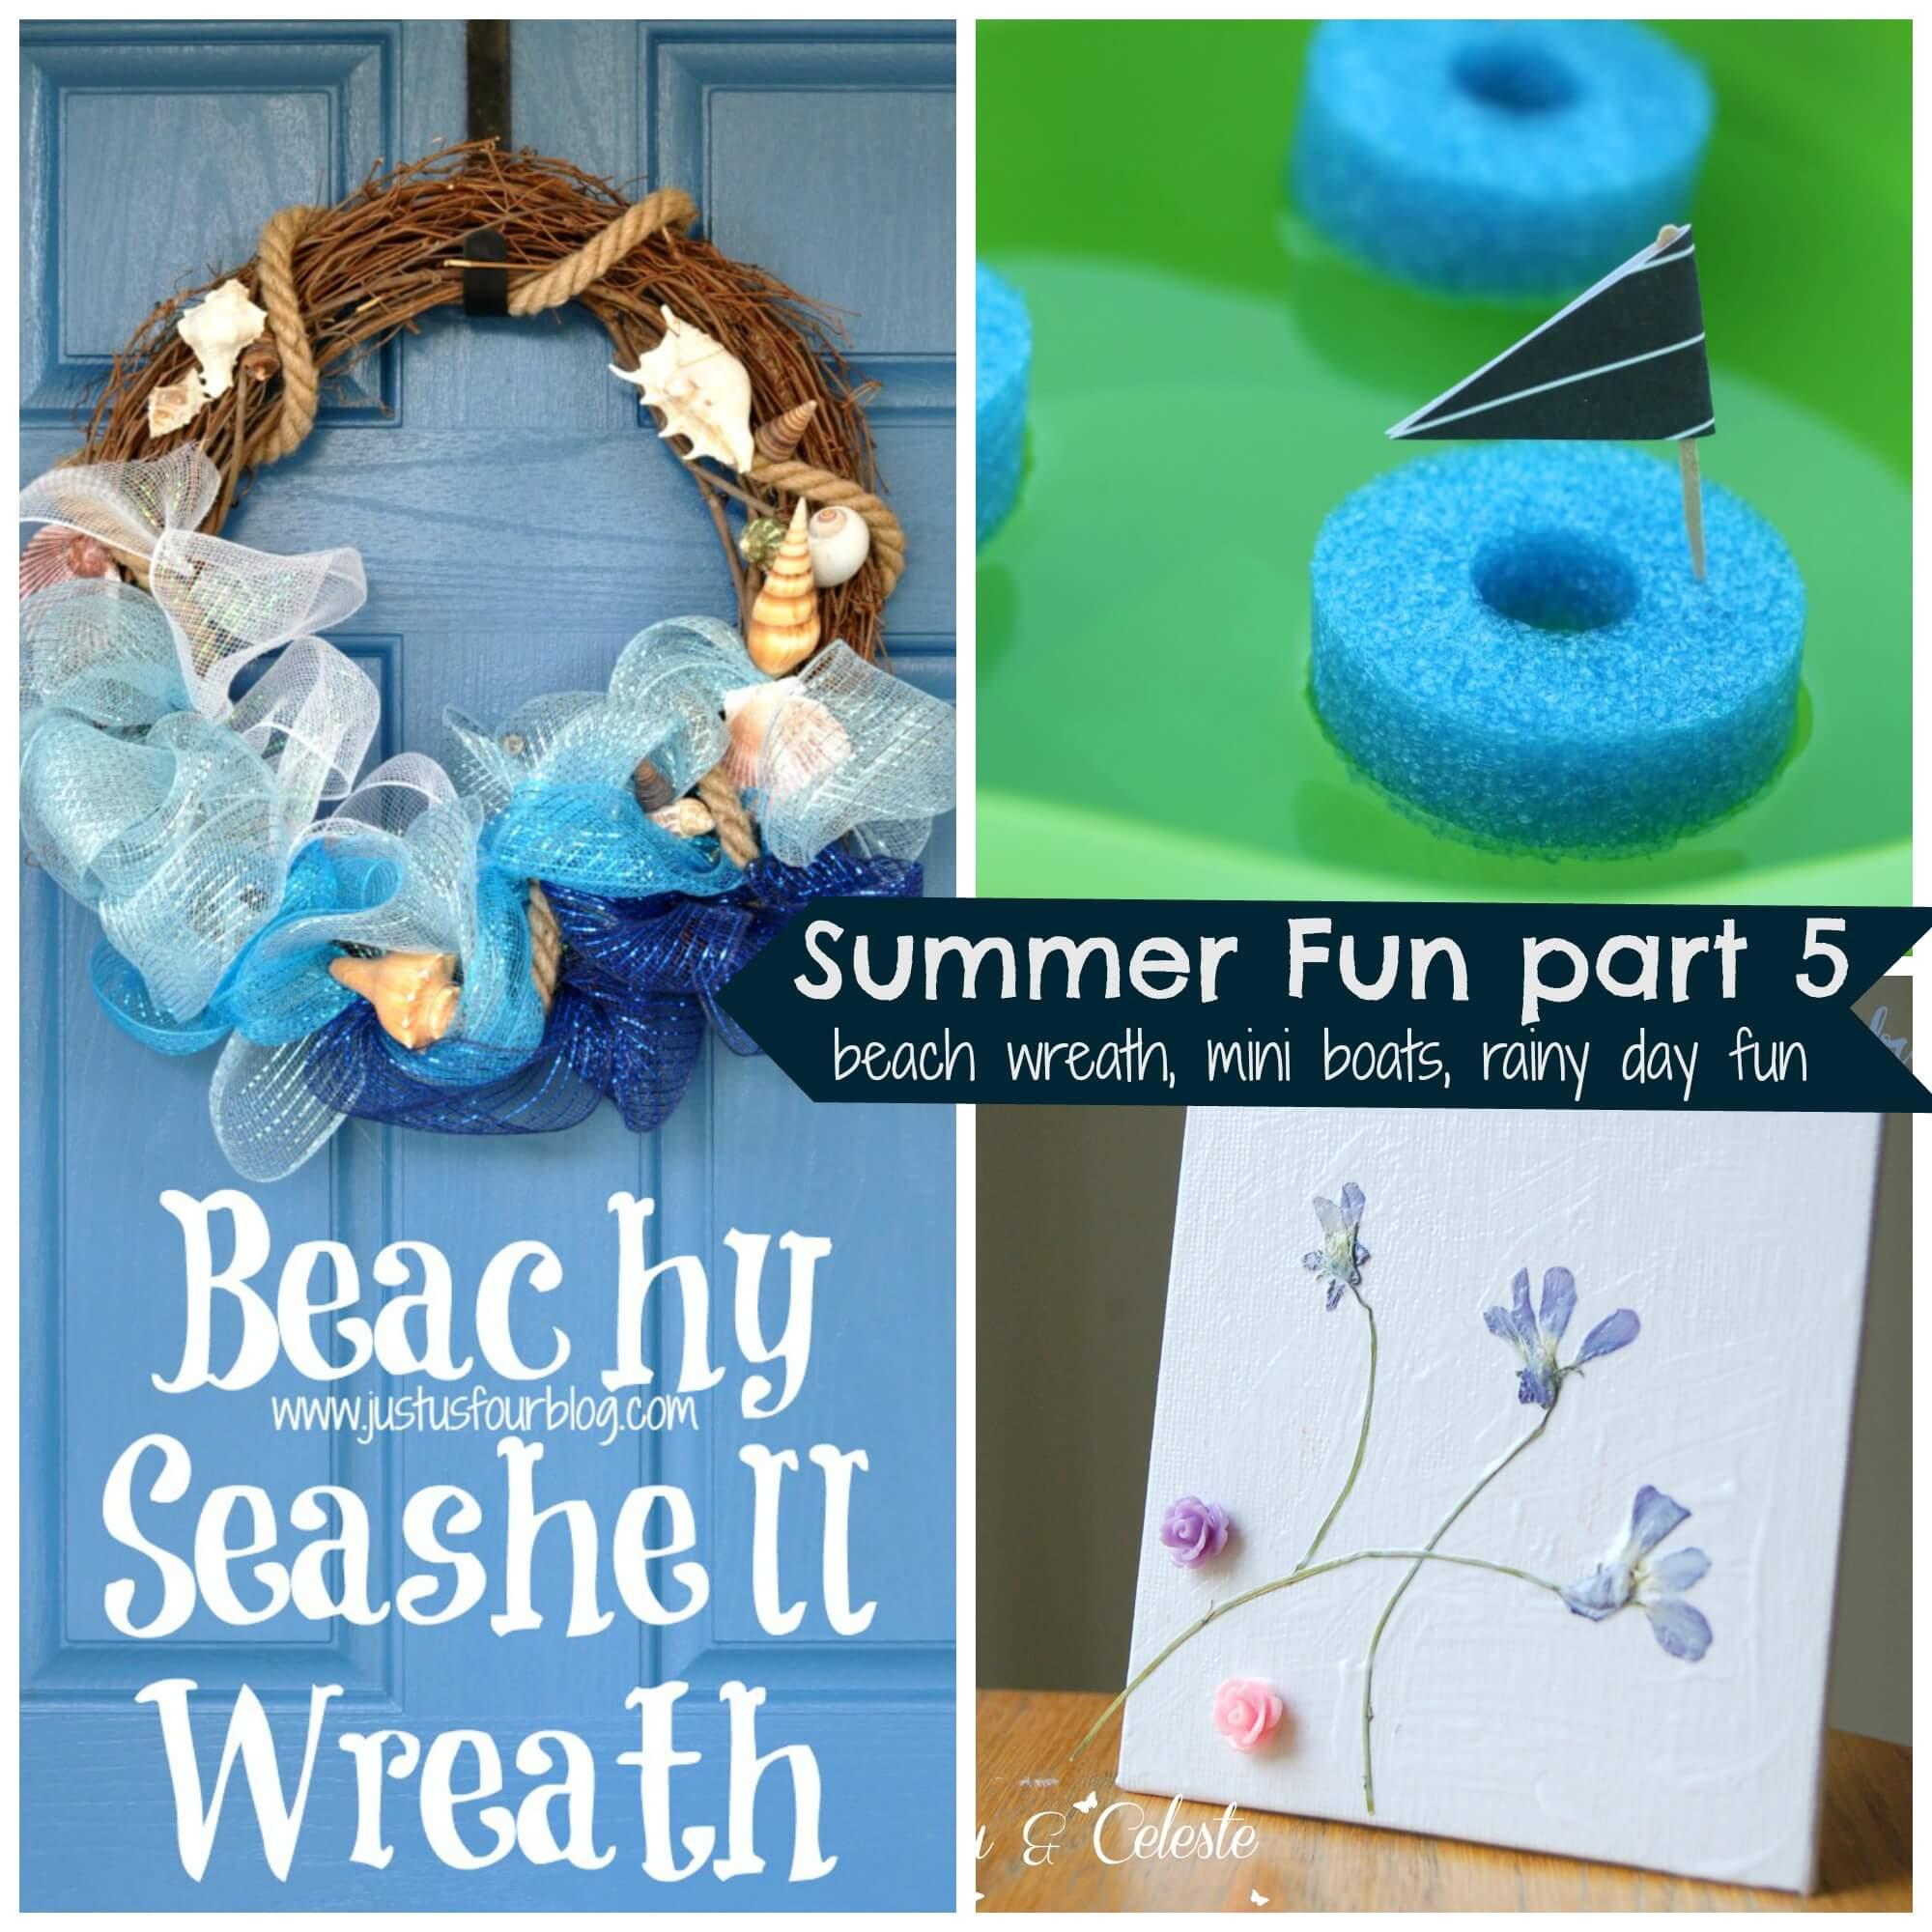 Summer Fun Week 5